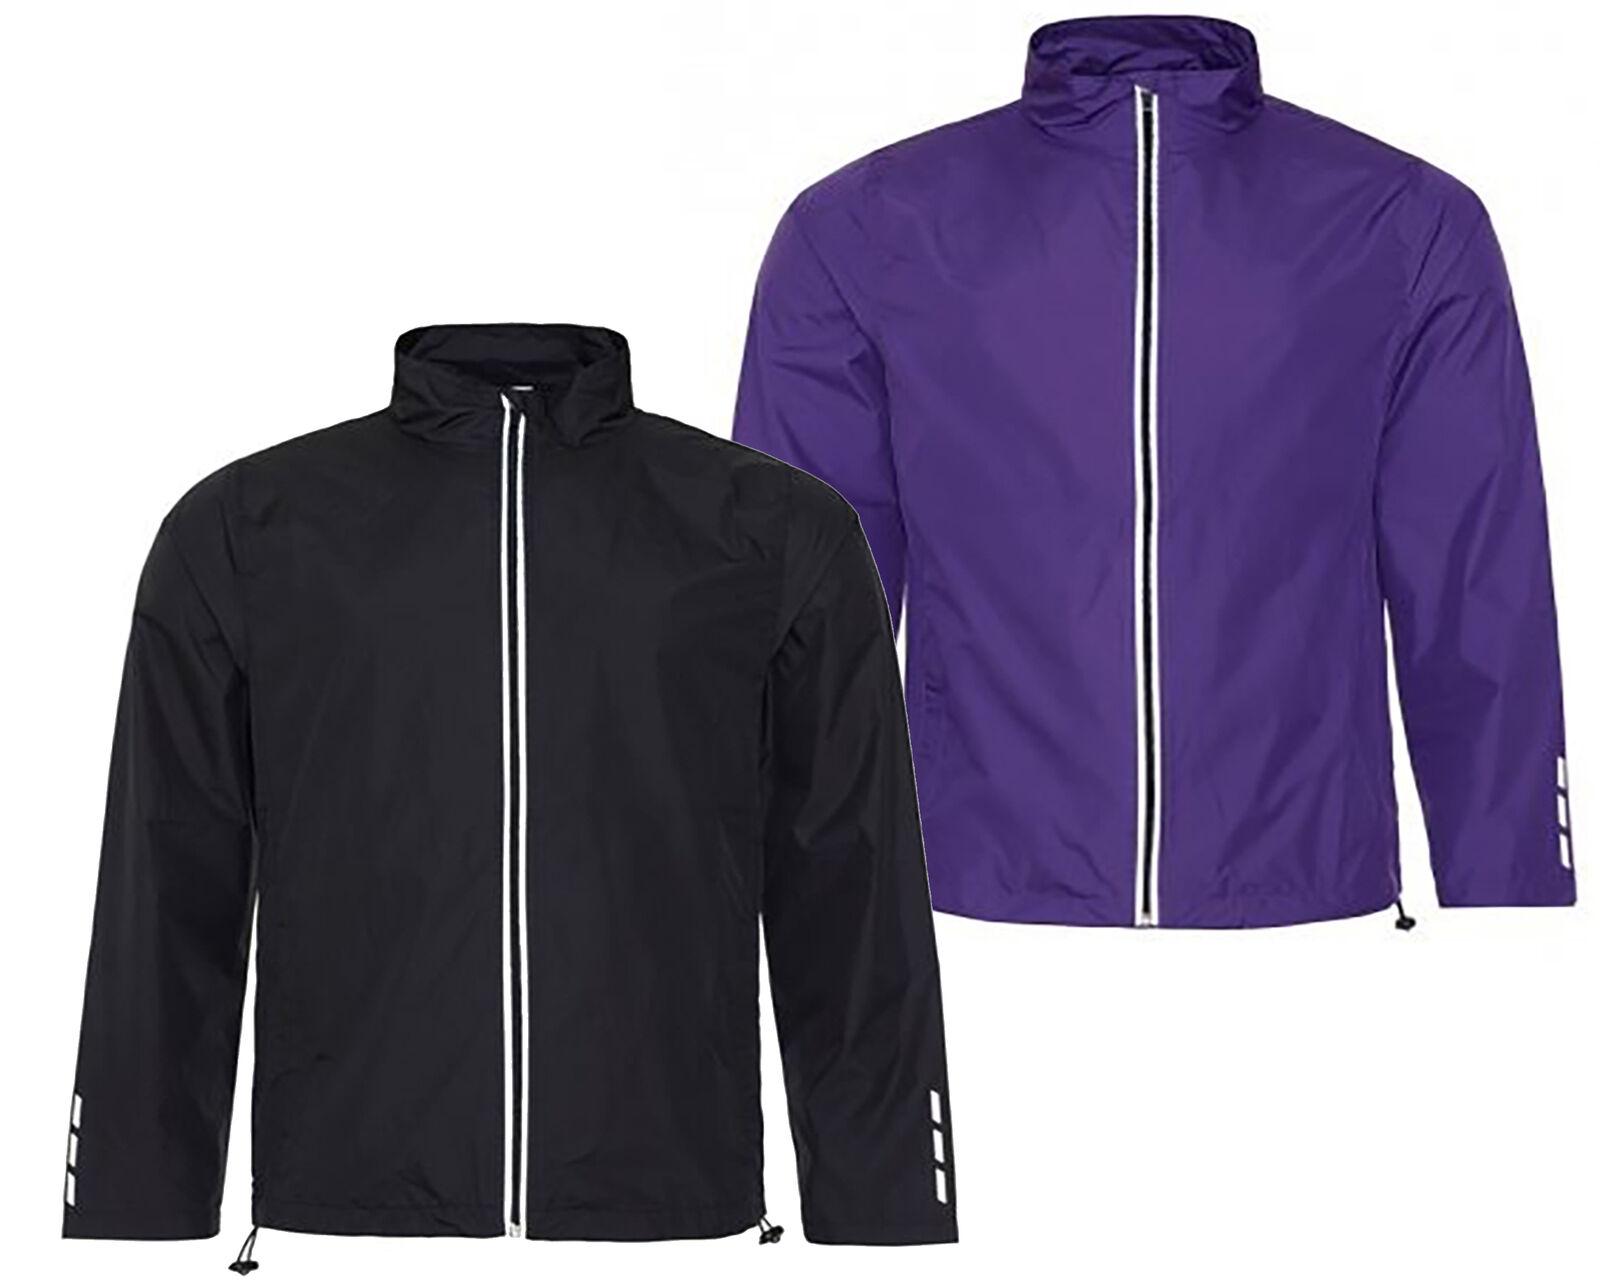 Running Cycling Jacket Windproof Sport Unisexe Premium Casual Léger Haut